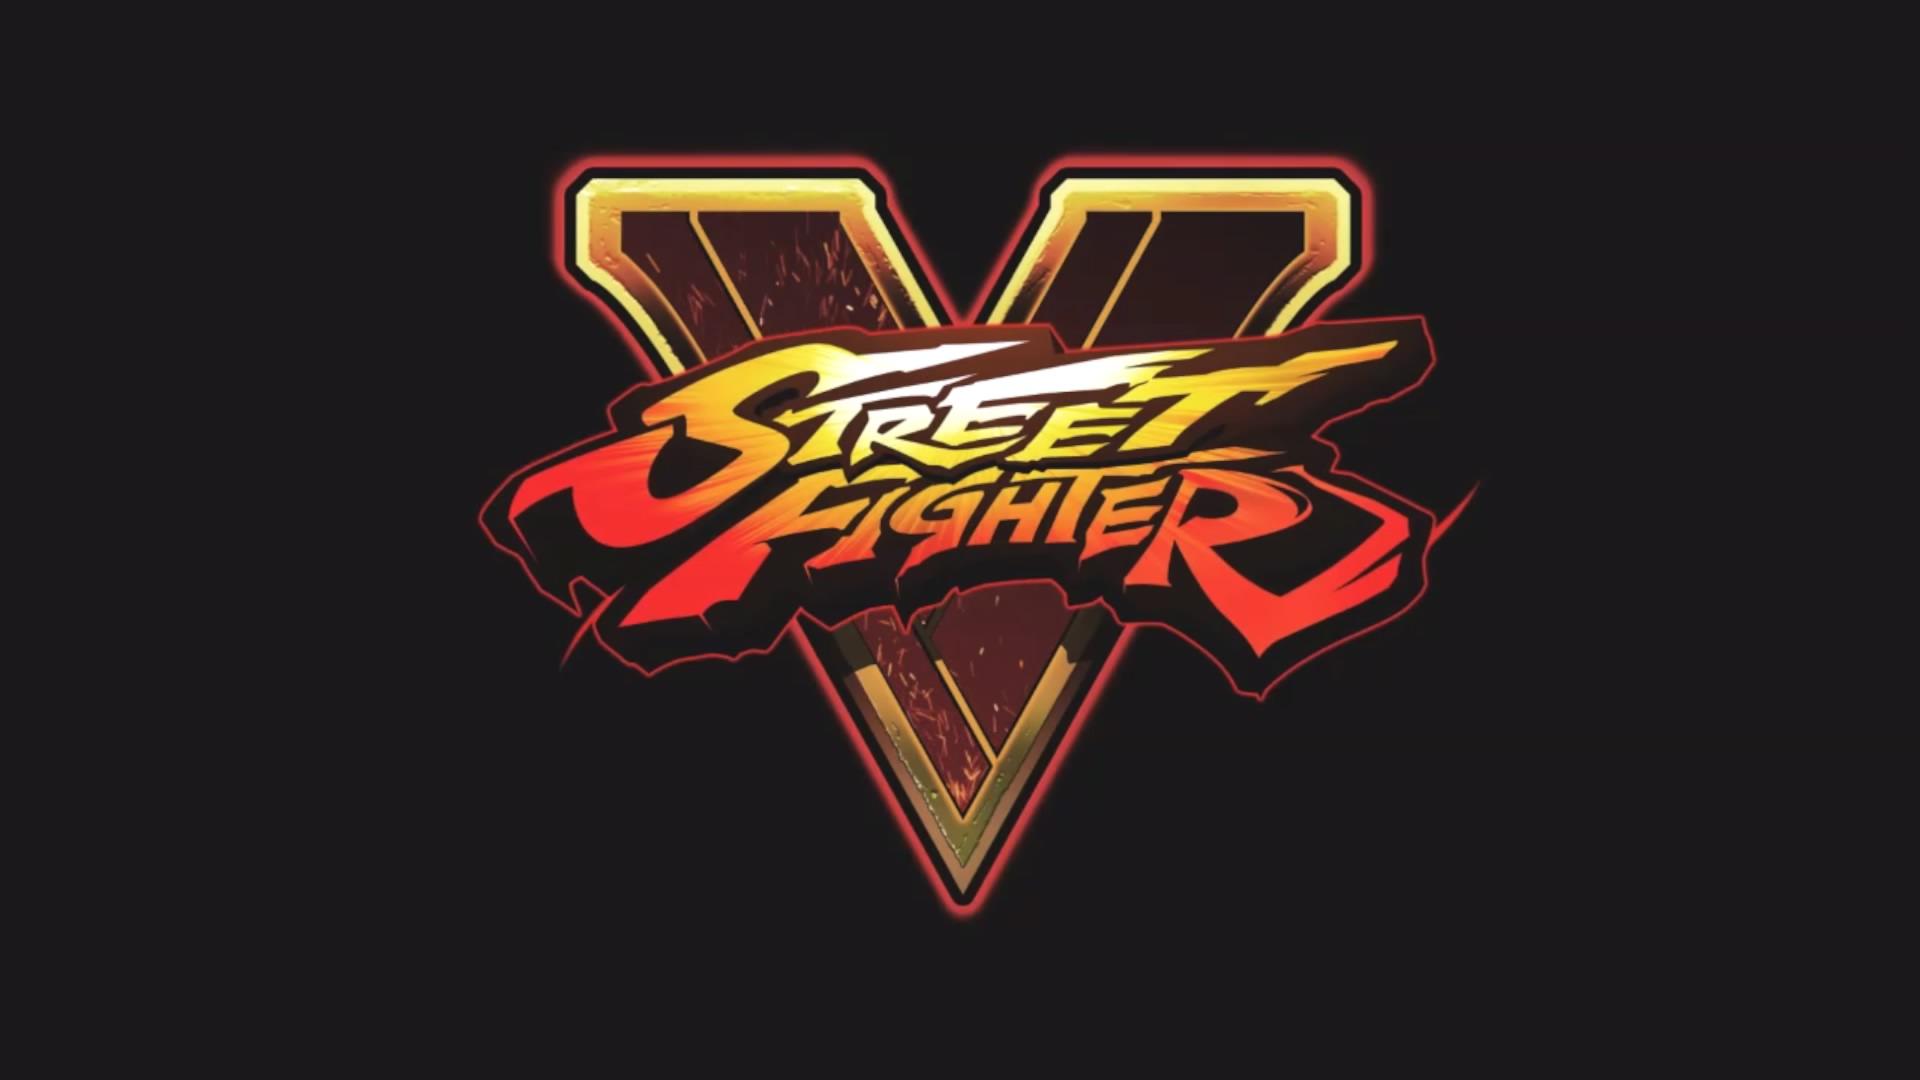 STREET FIGHTER V_20160216062116